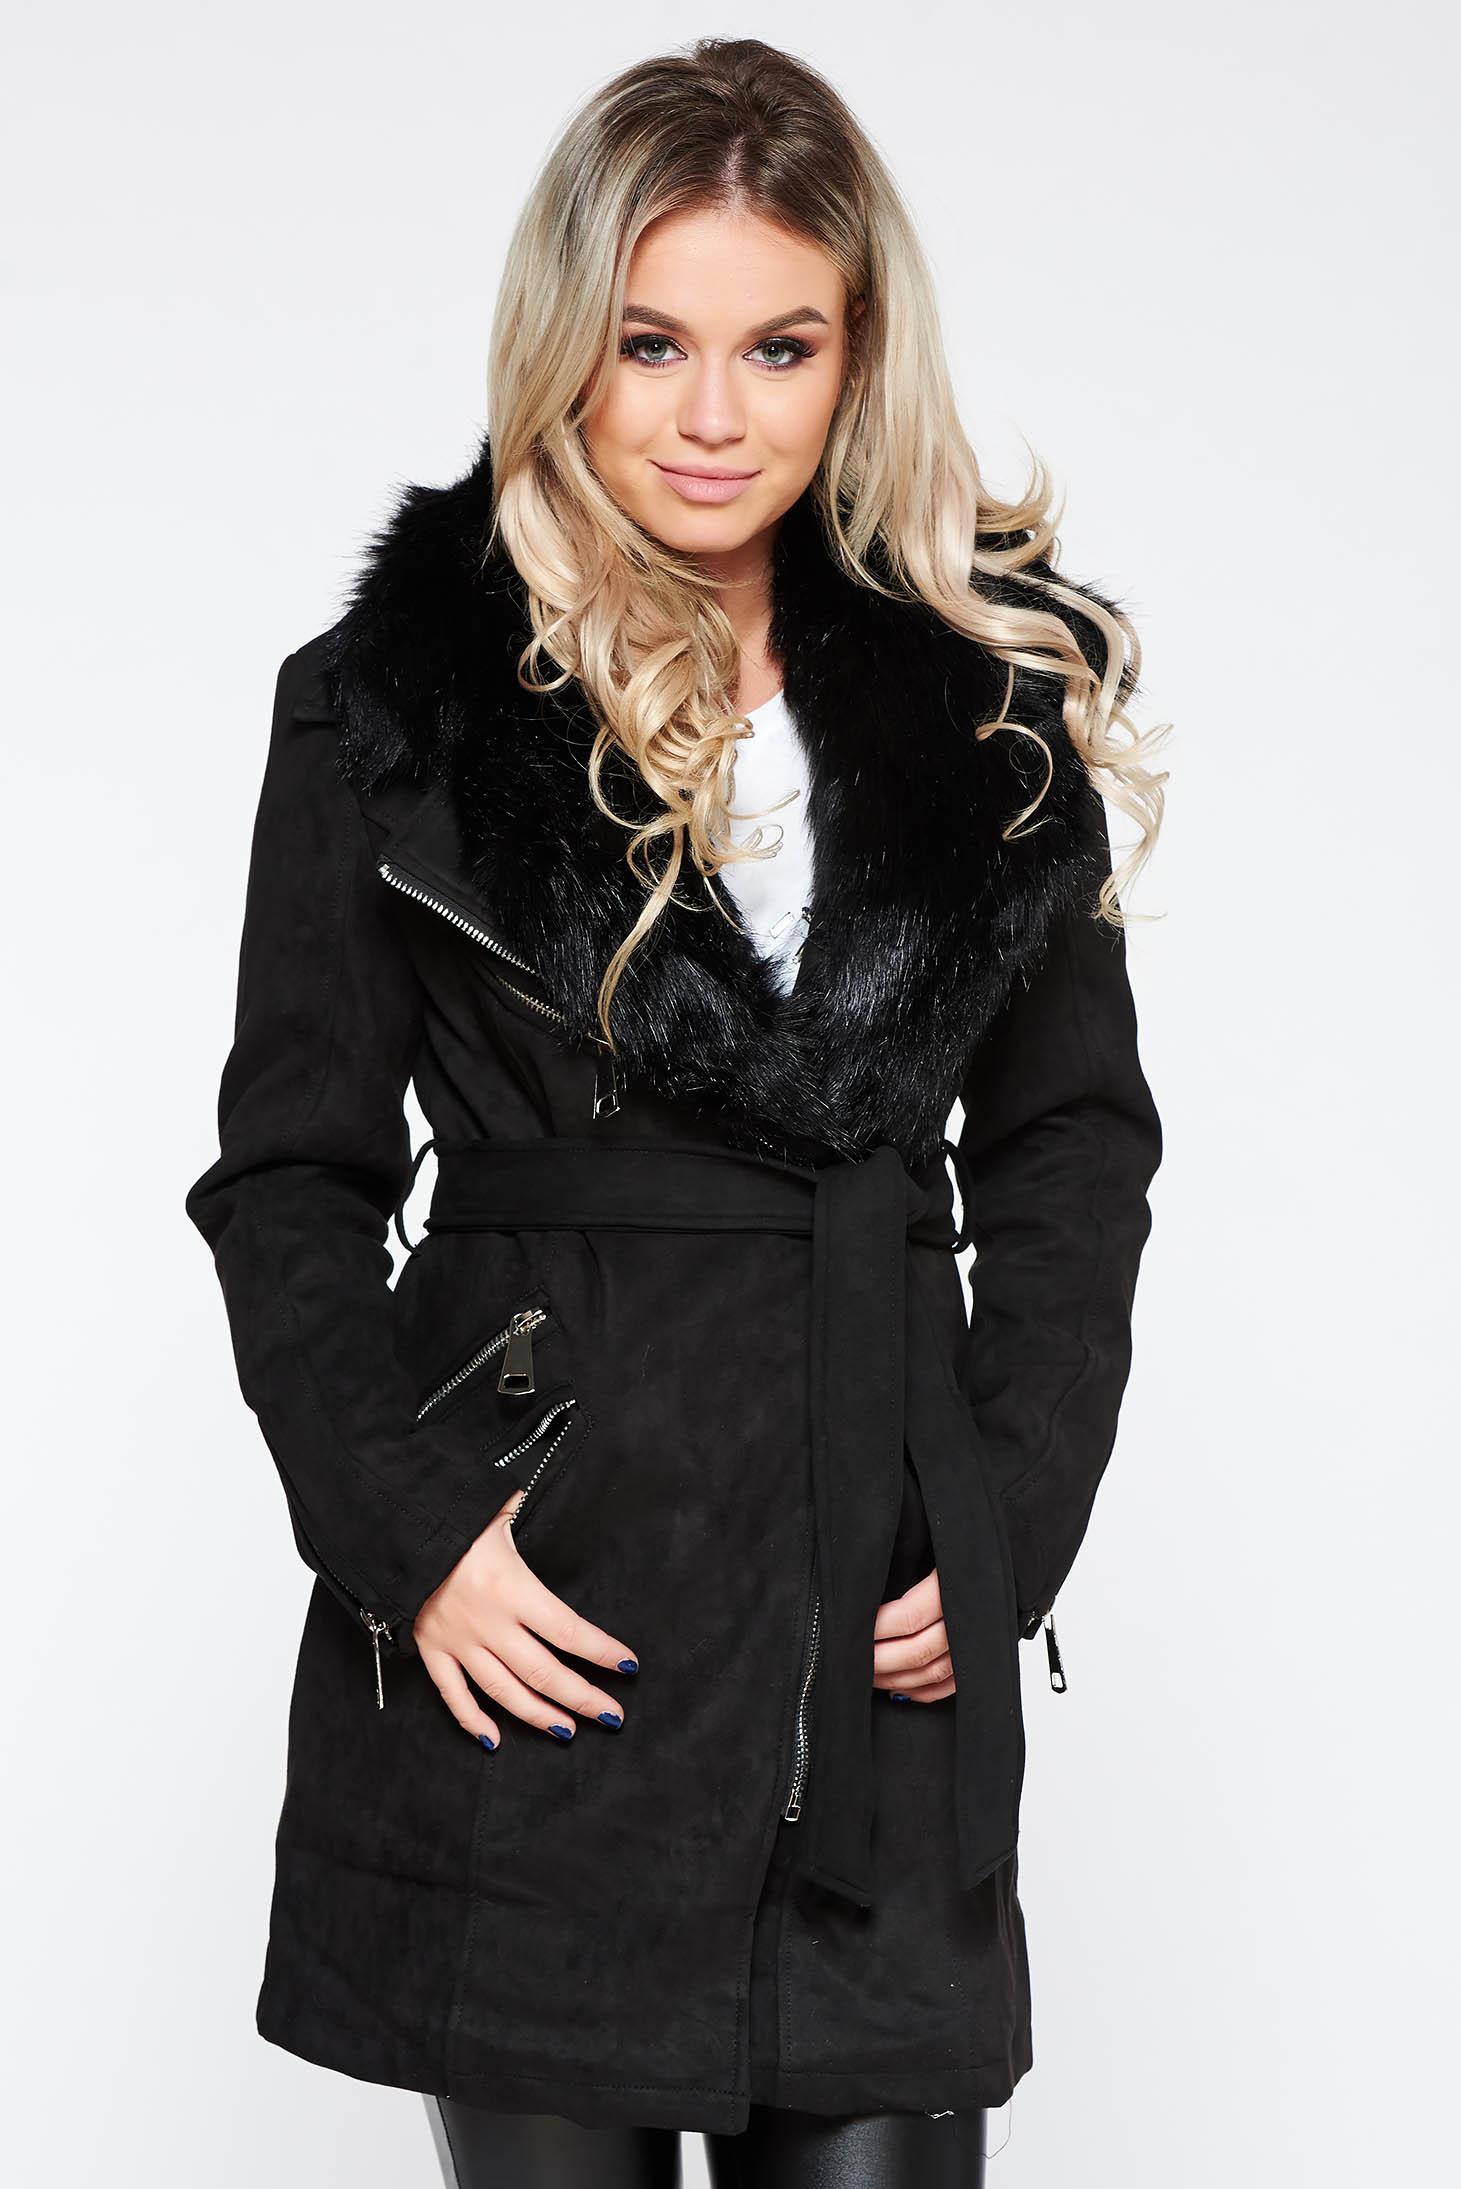 Geci dama online! Modele variate de geci si jachete de dama moderne online!